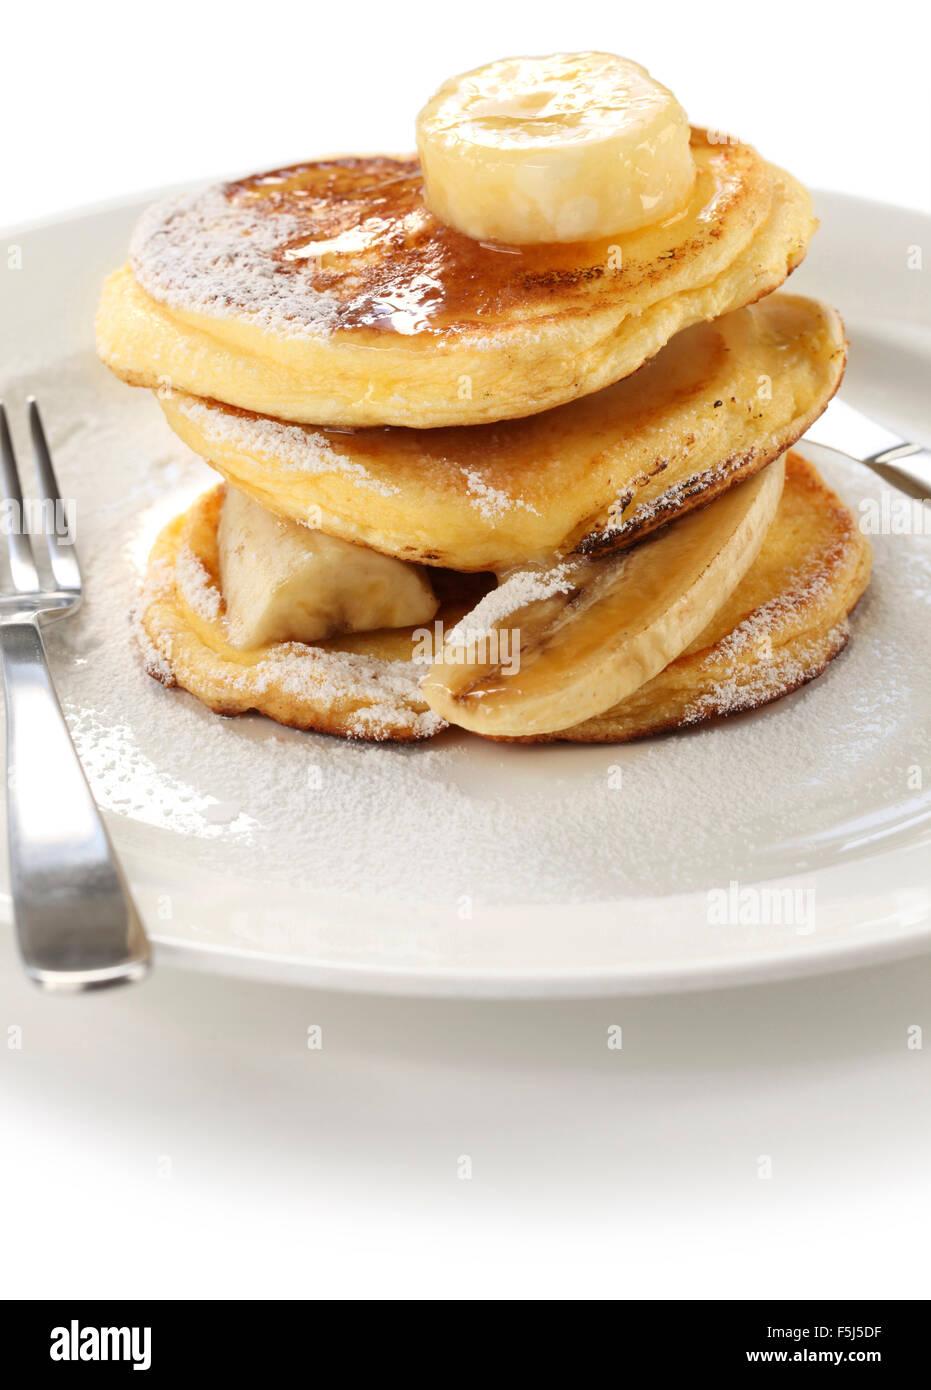 fluffy ricotta pancakes with banana isolated on white background - Stock Image